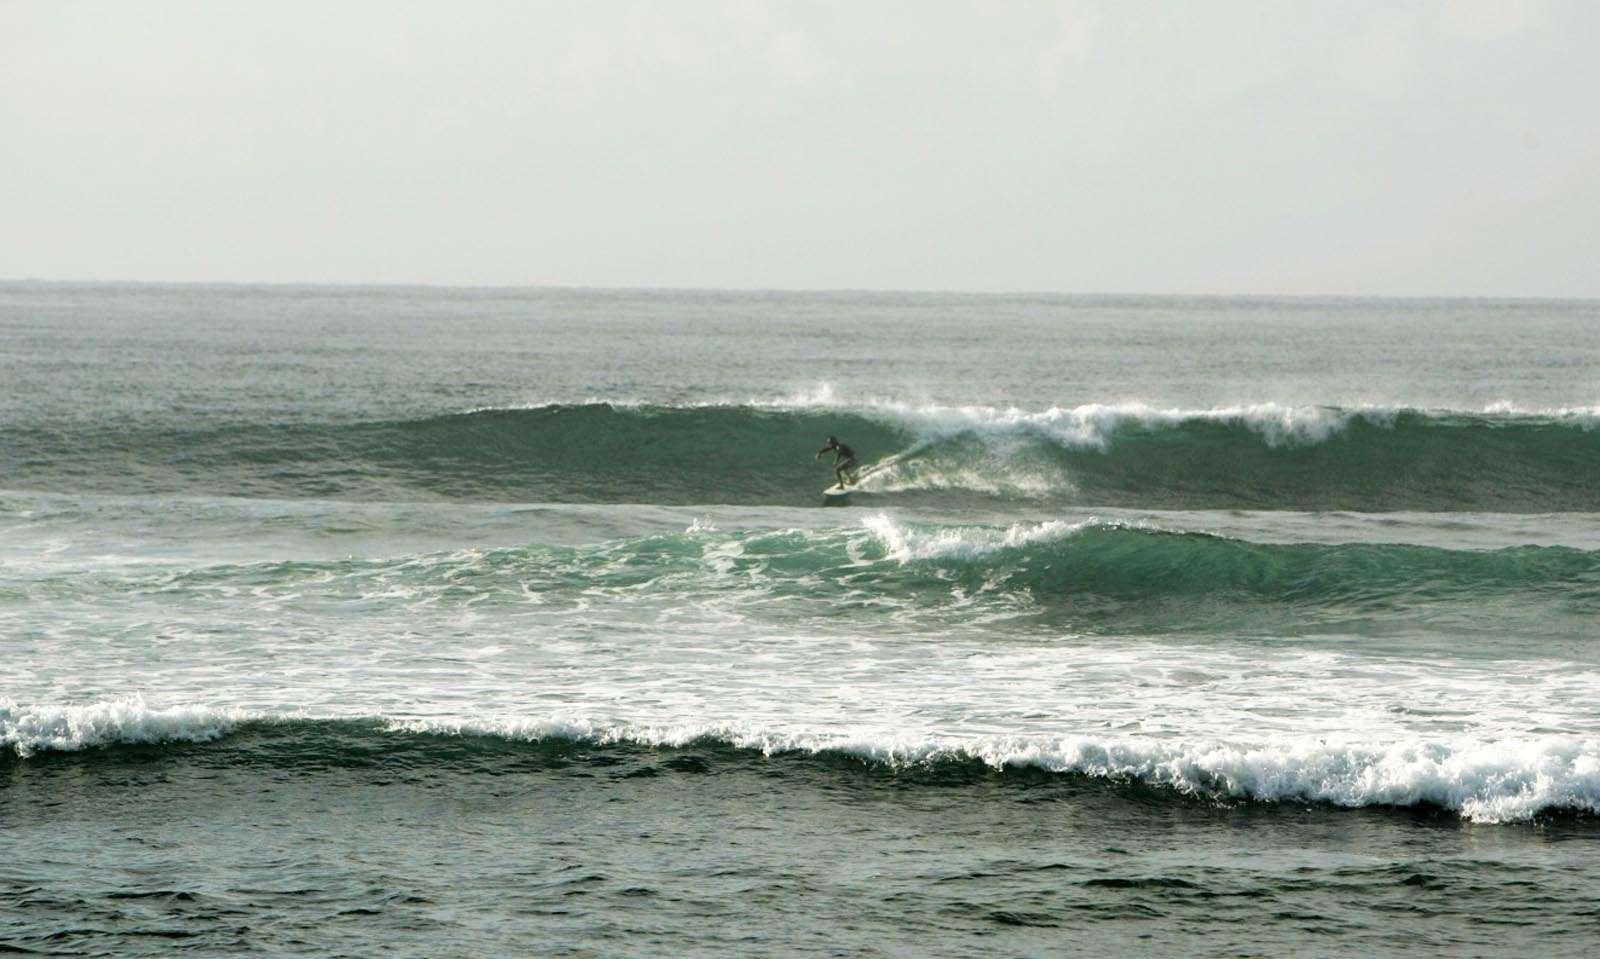 7 Lokasi Surfing Terbaik Bali Kura Guide Pantai Serangan Terletak